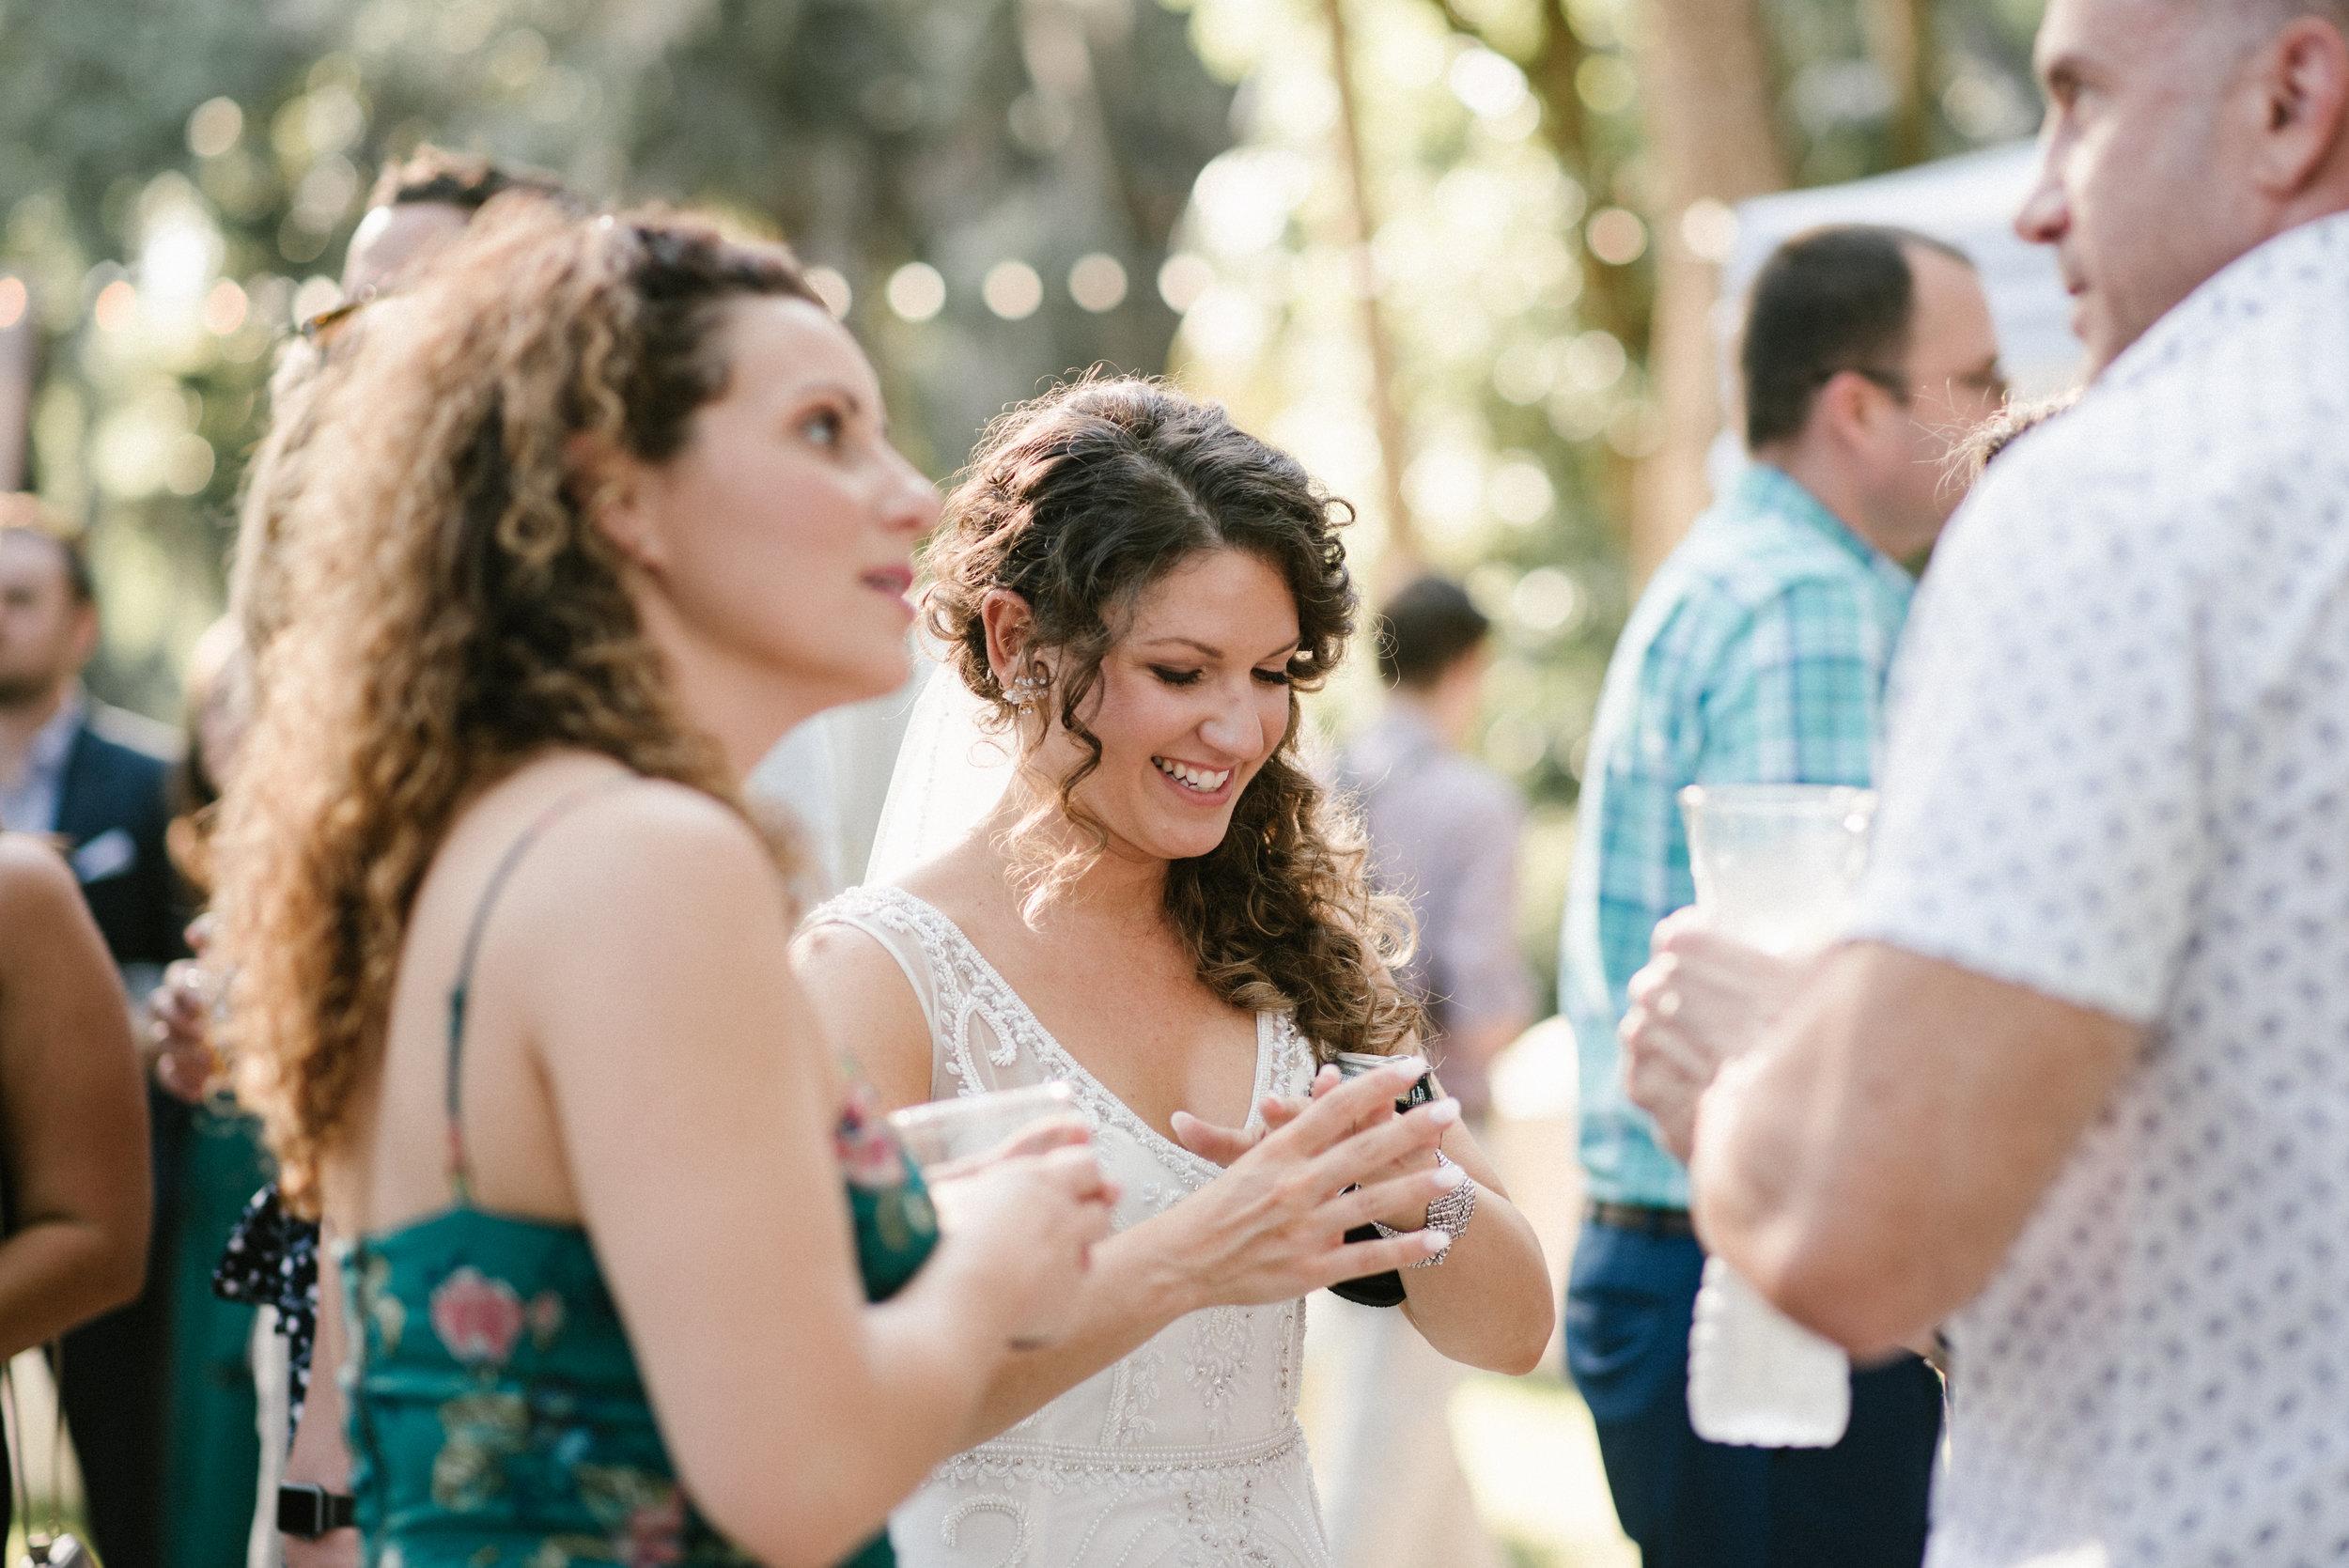 mclaughlin-wedding-647.jpg